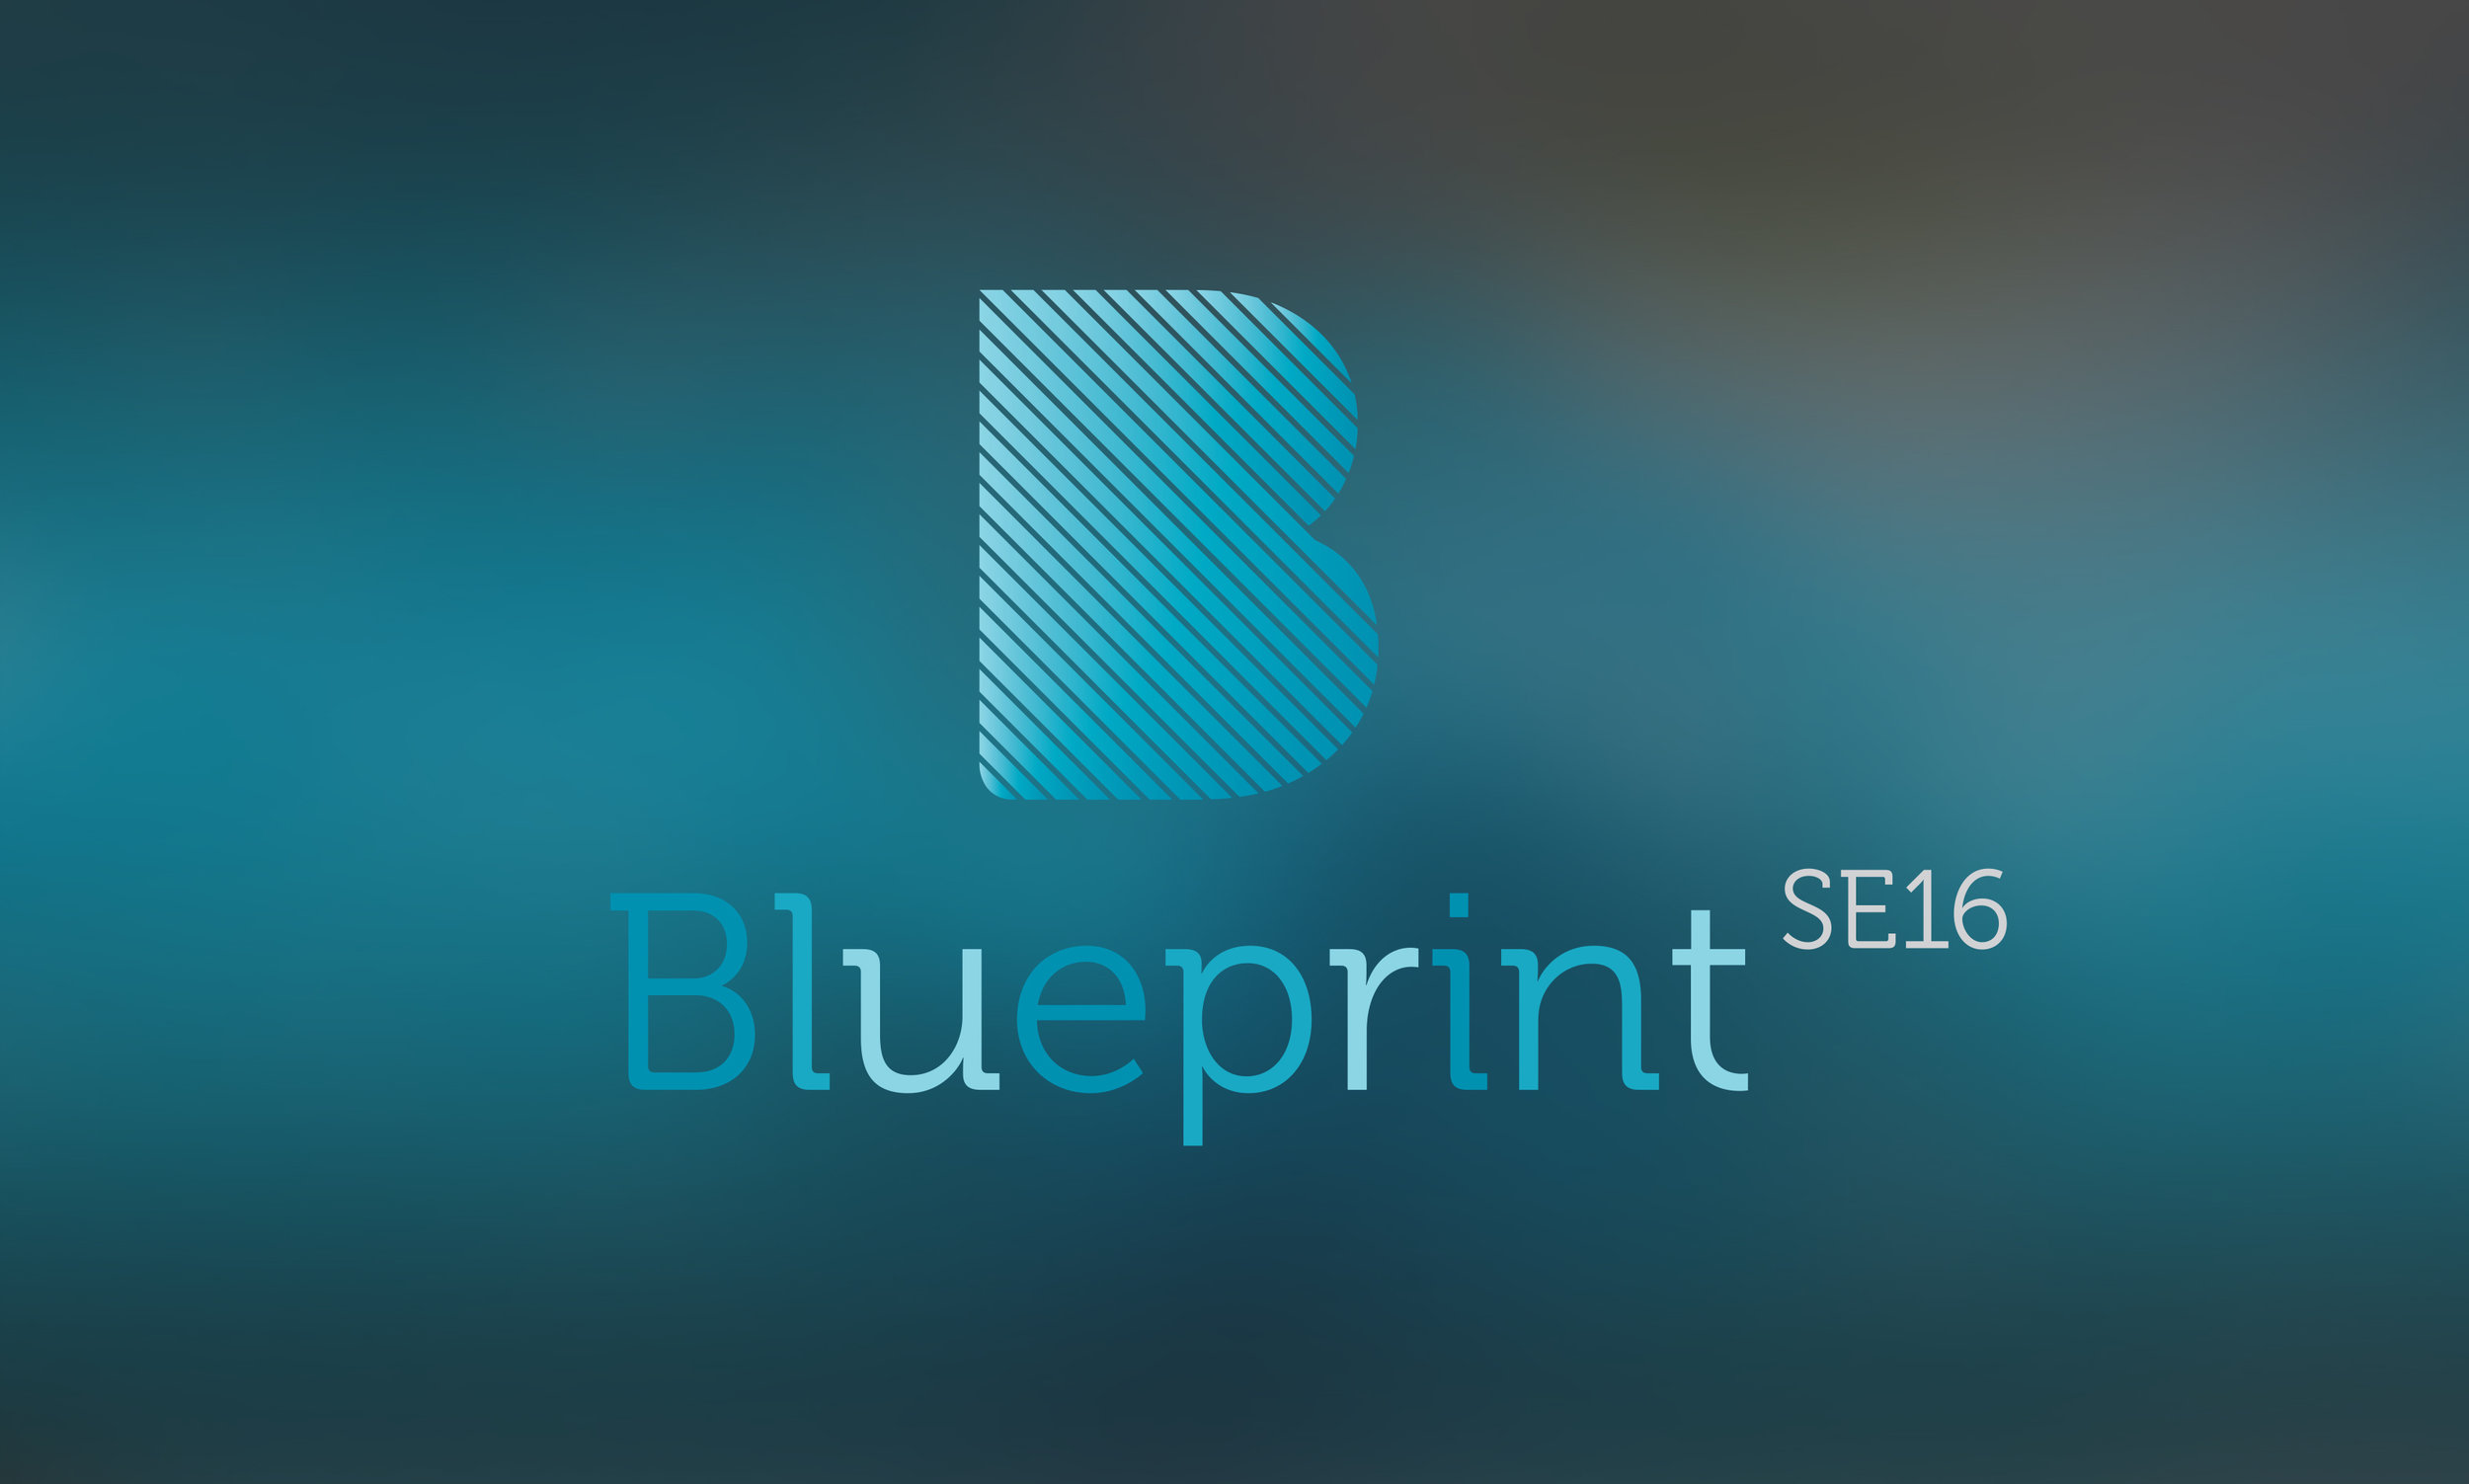 Blueprint new site blueprint malvernweather Images